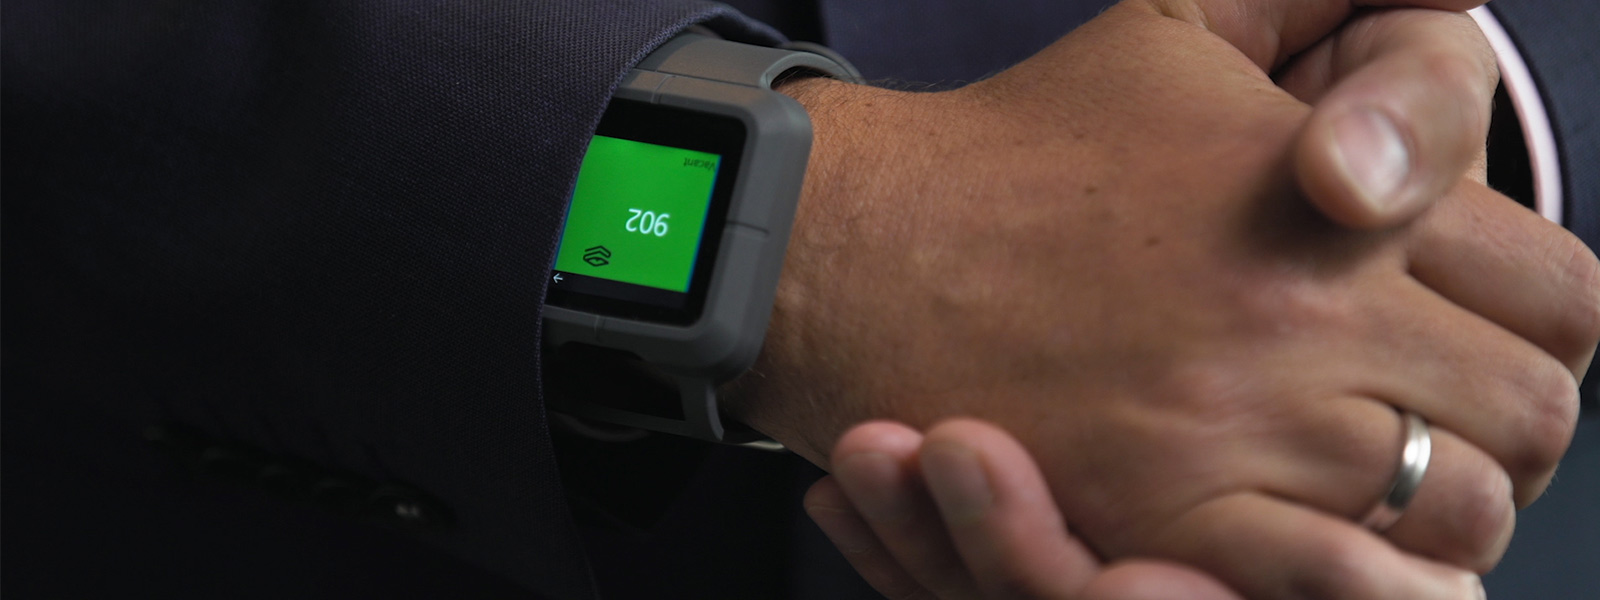 Hotelangestellter mit tragbarem interaktivem Gerät